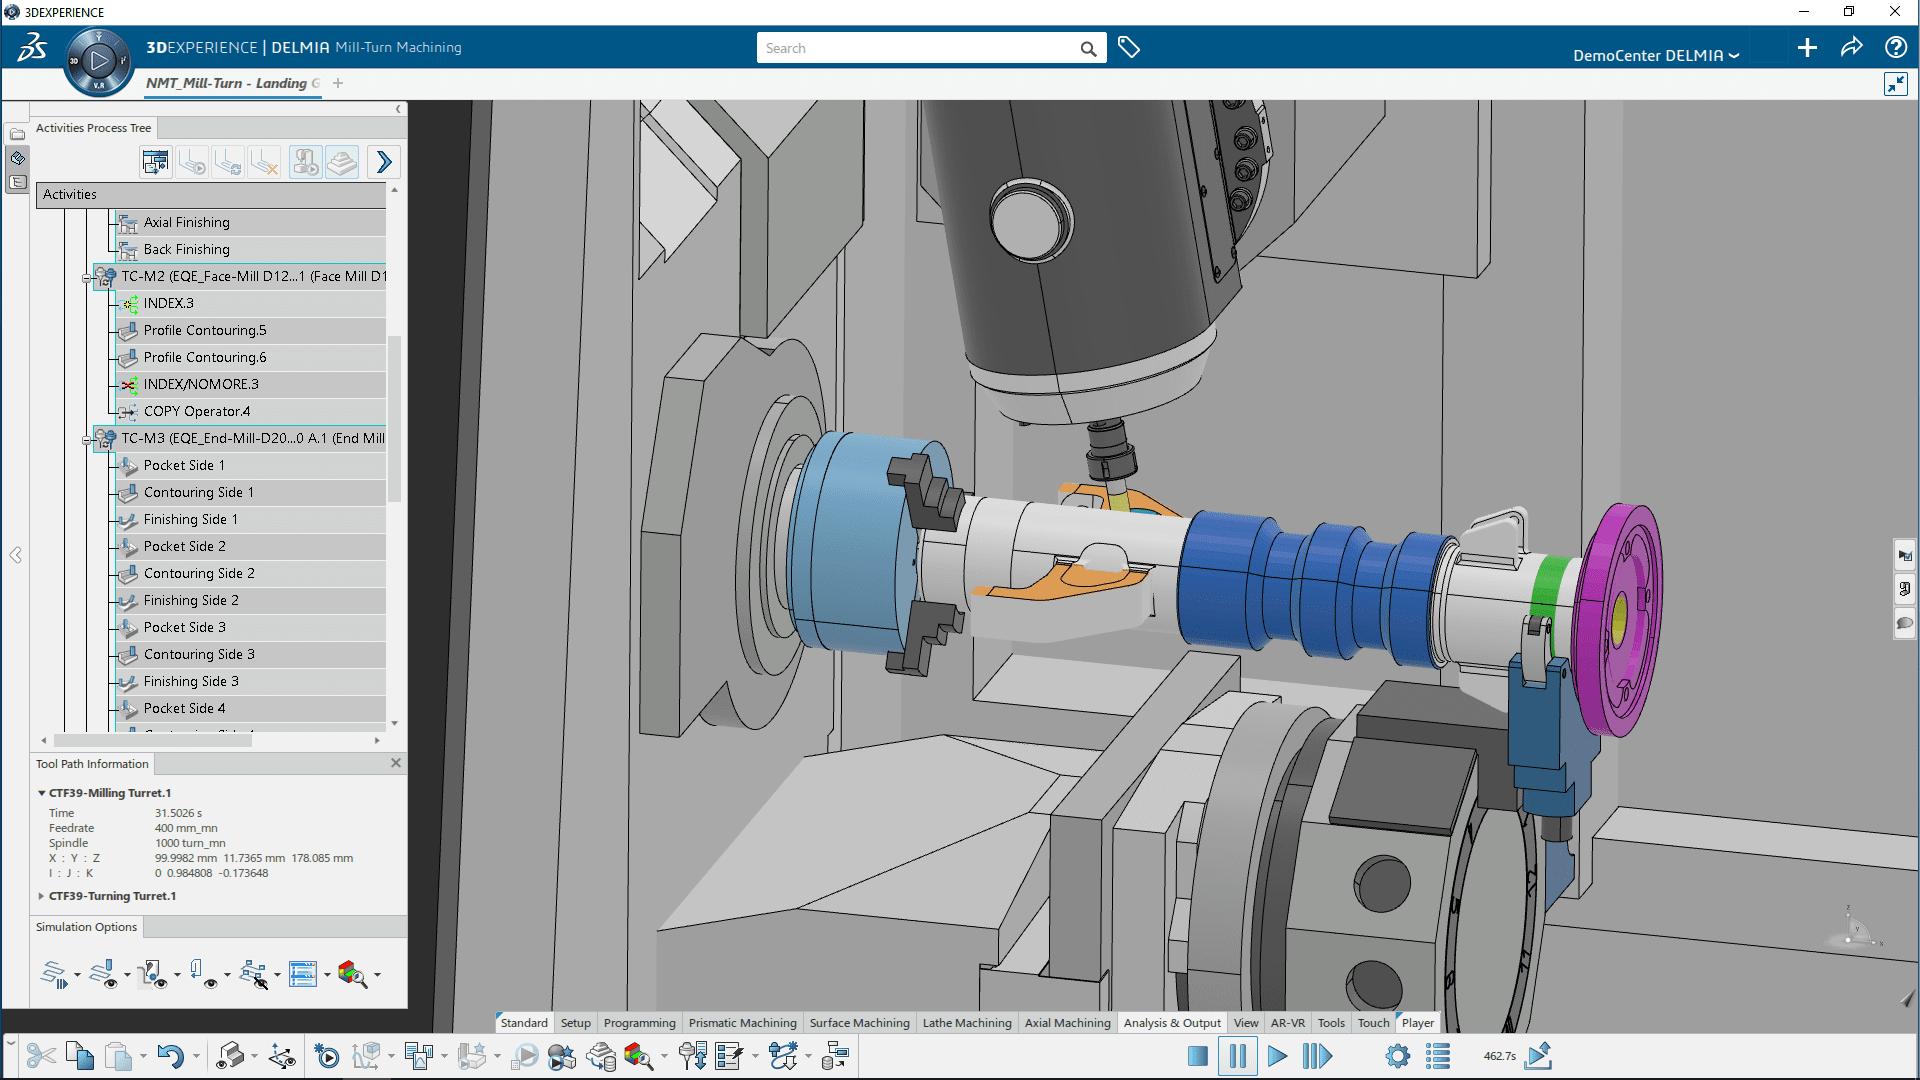 3DEXPERIENCE DELIMIA Mill-Turn Machining: Bauteilsimulation